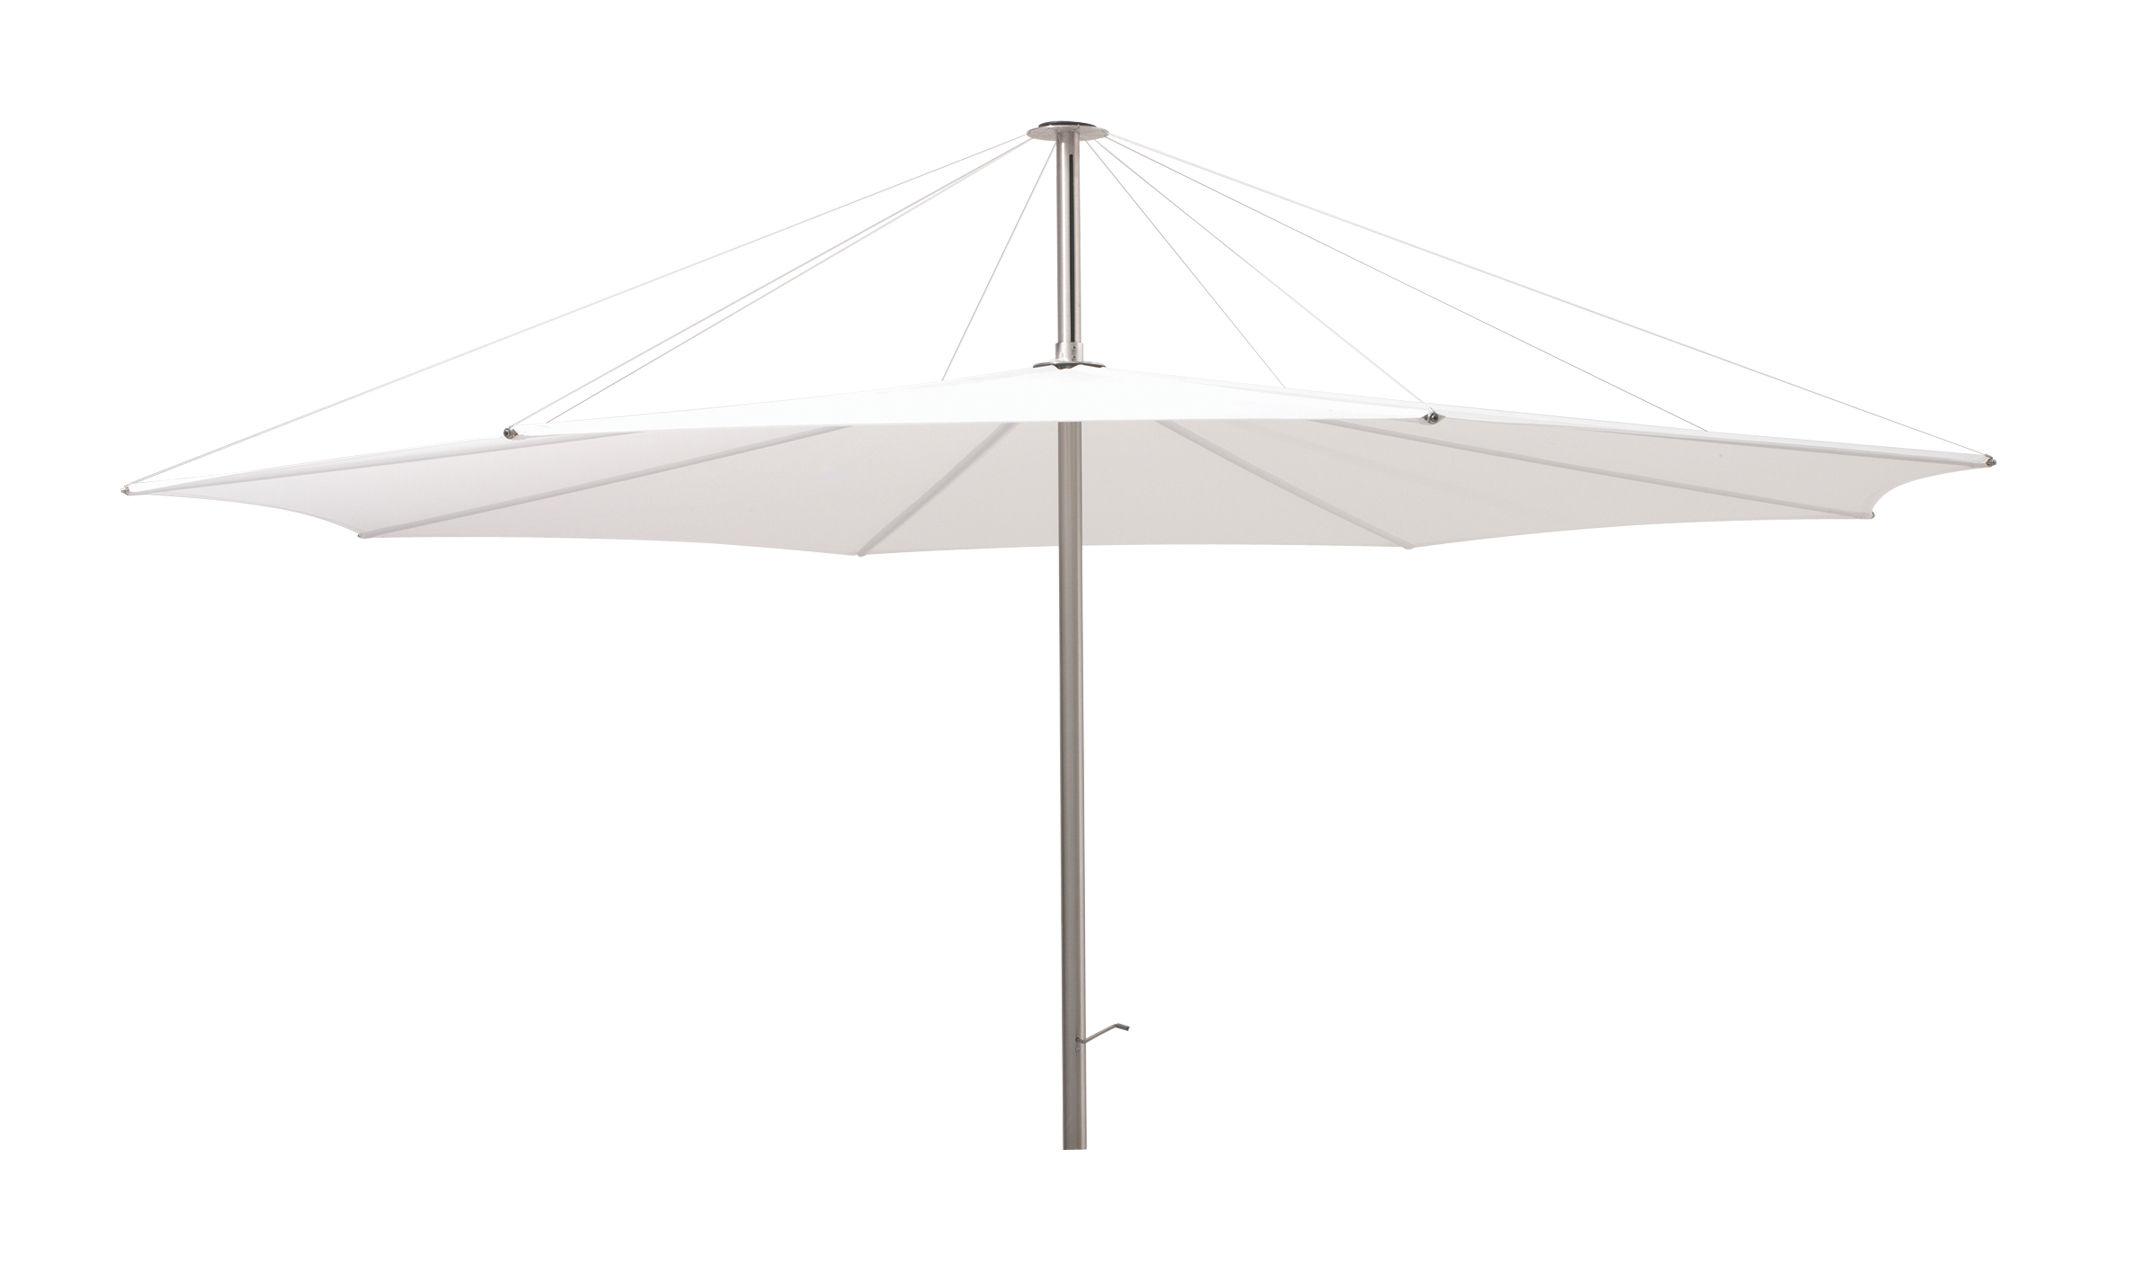 Jardin - Parasols - Parasol Inumbra Ø 350 cm - Extremis - Parasol blanc - Acier inoxydable, Toile de polyester